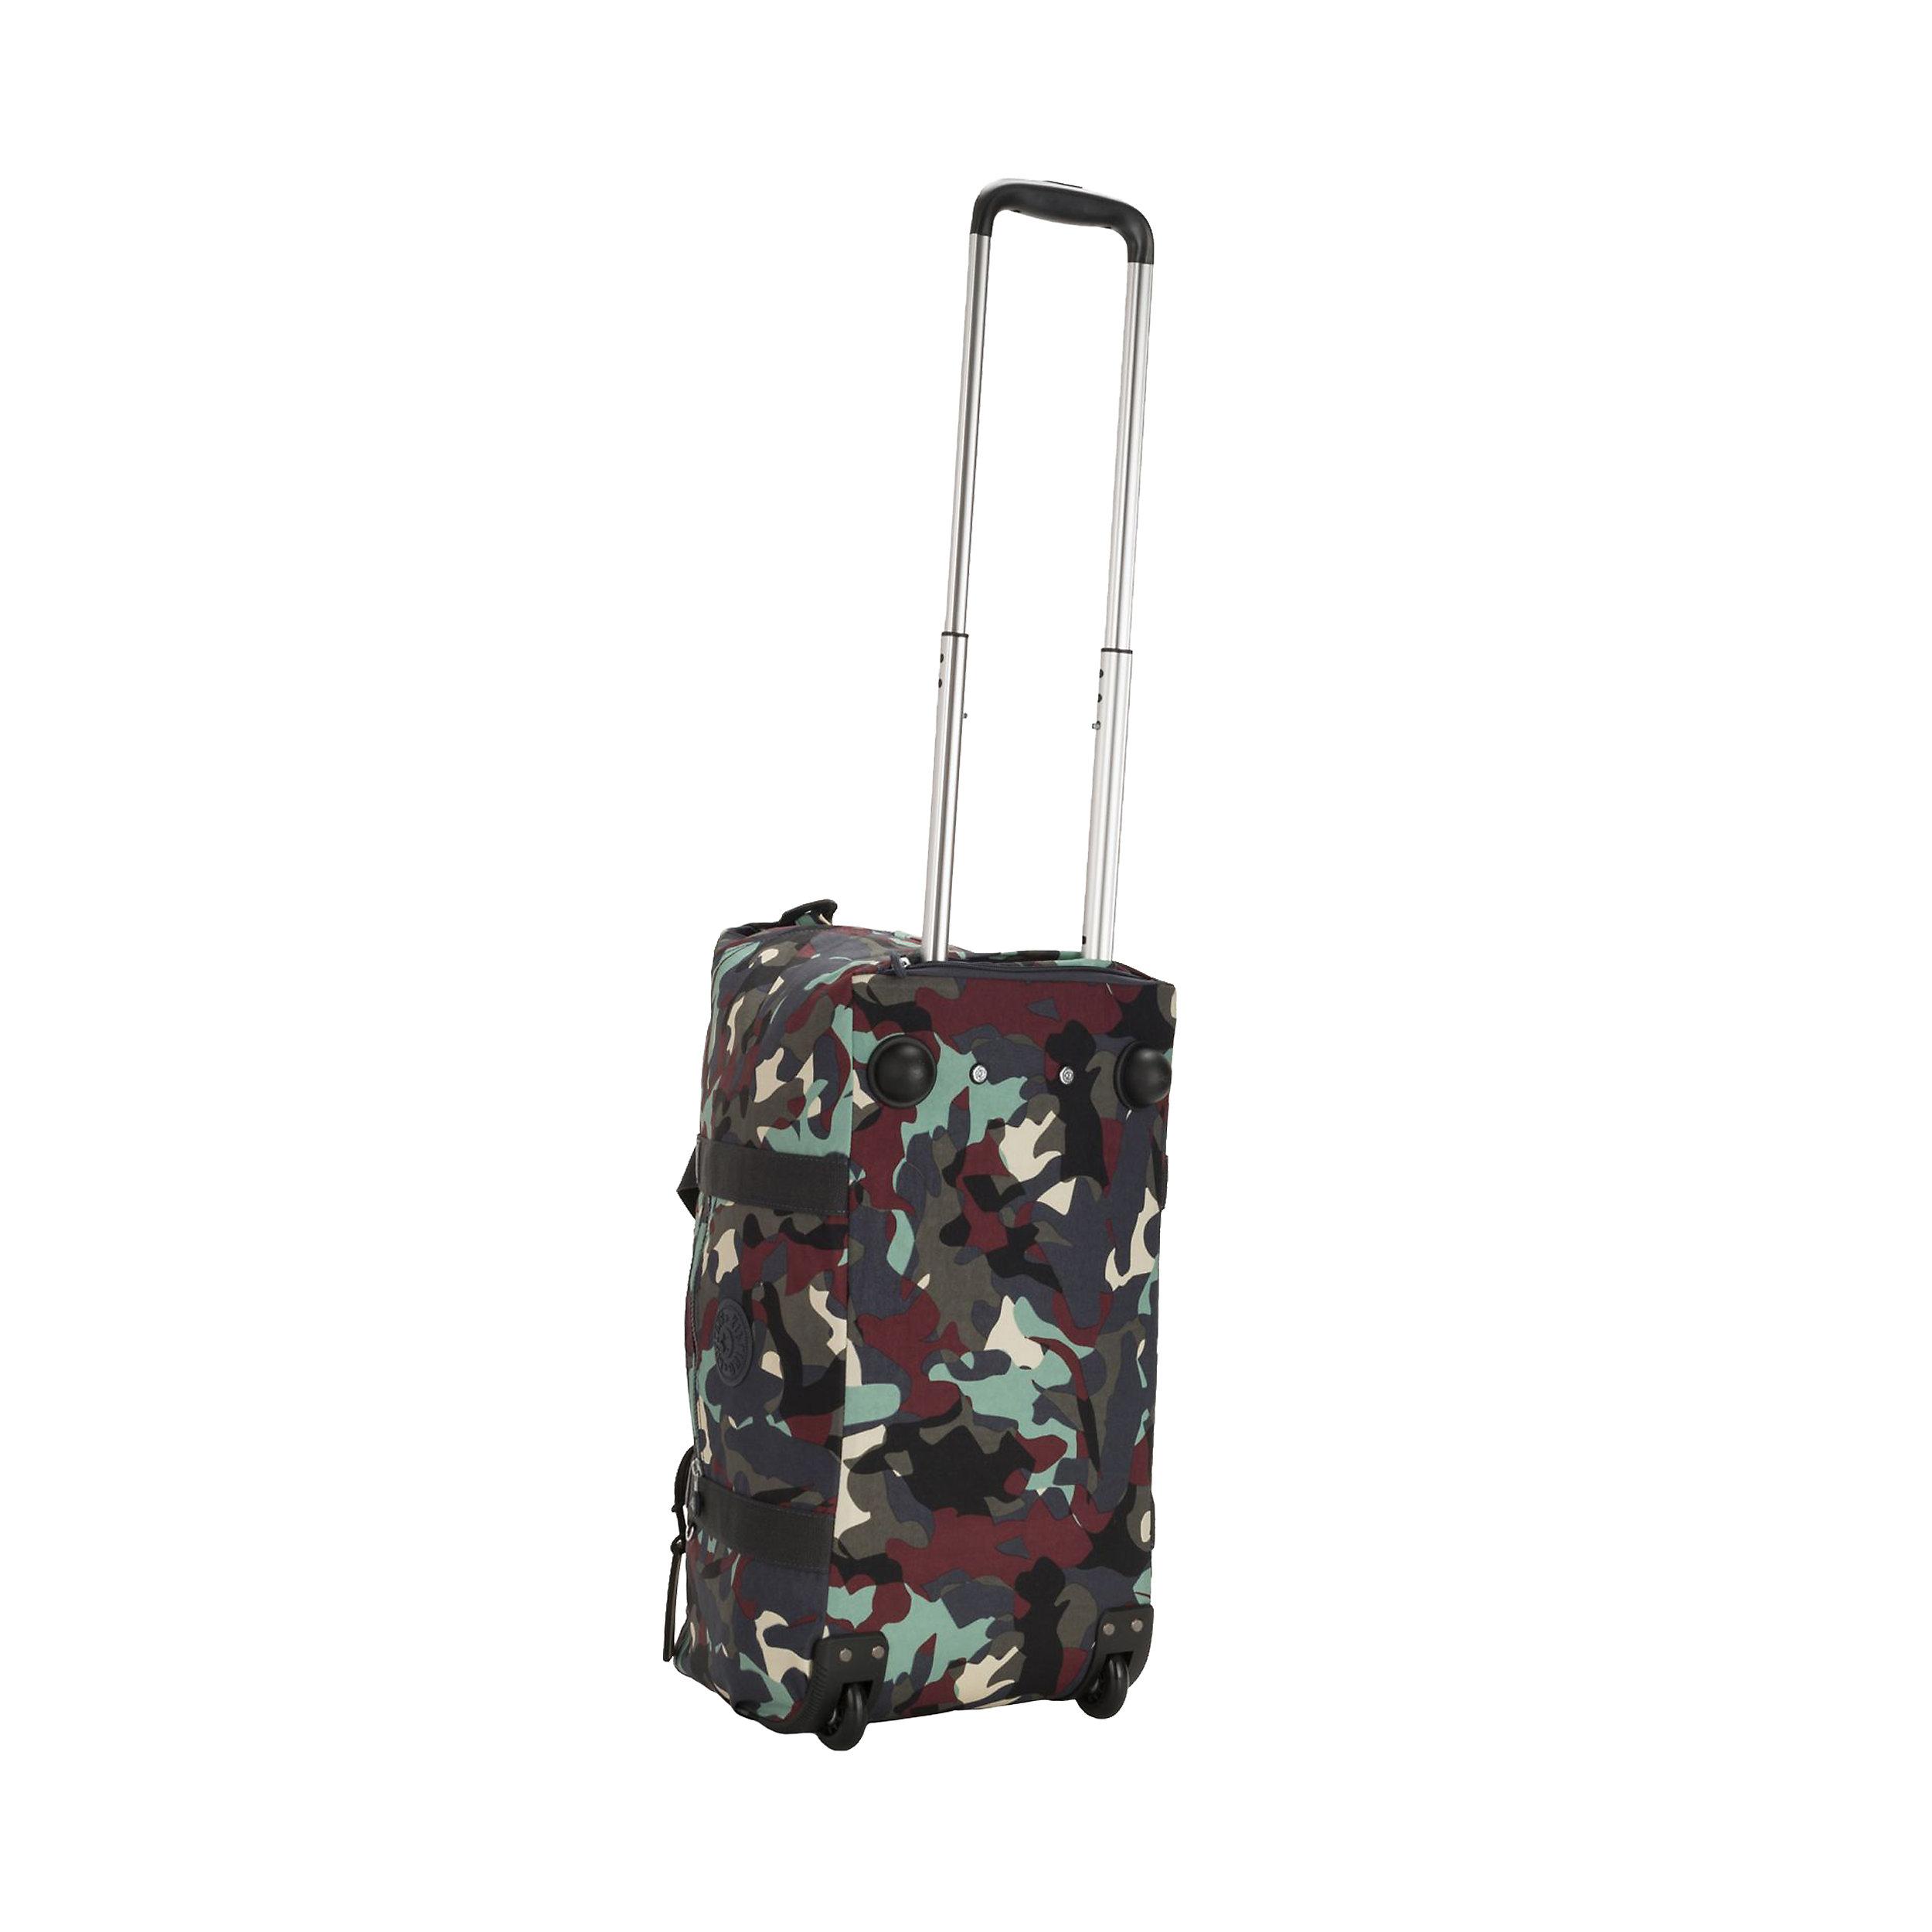 Wheeled Travel Bag with 2 wheels Art on Wheels M Basic 41 Liter